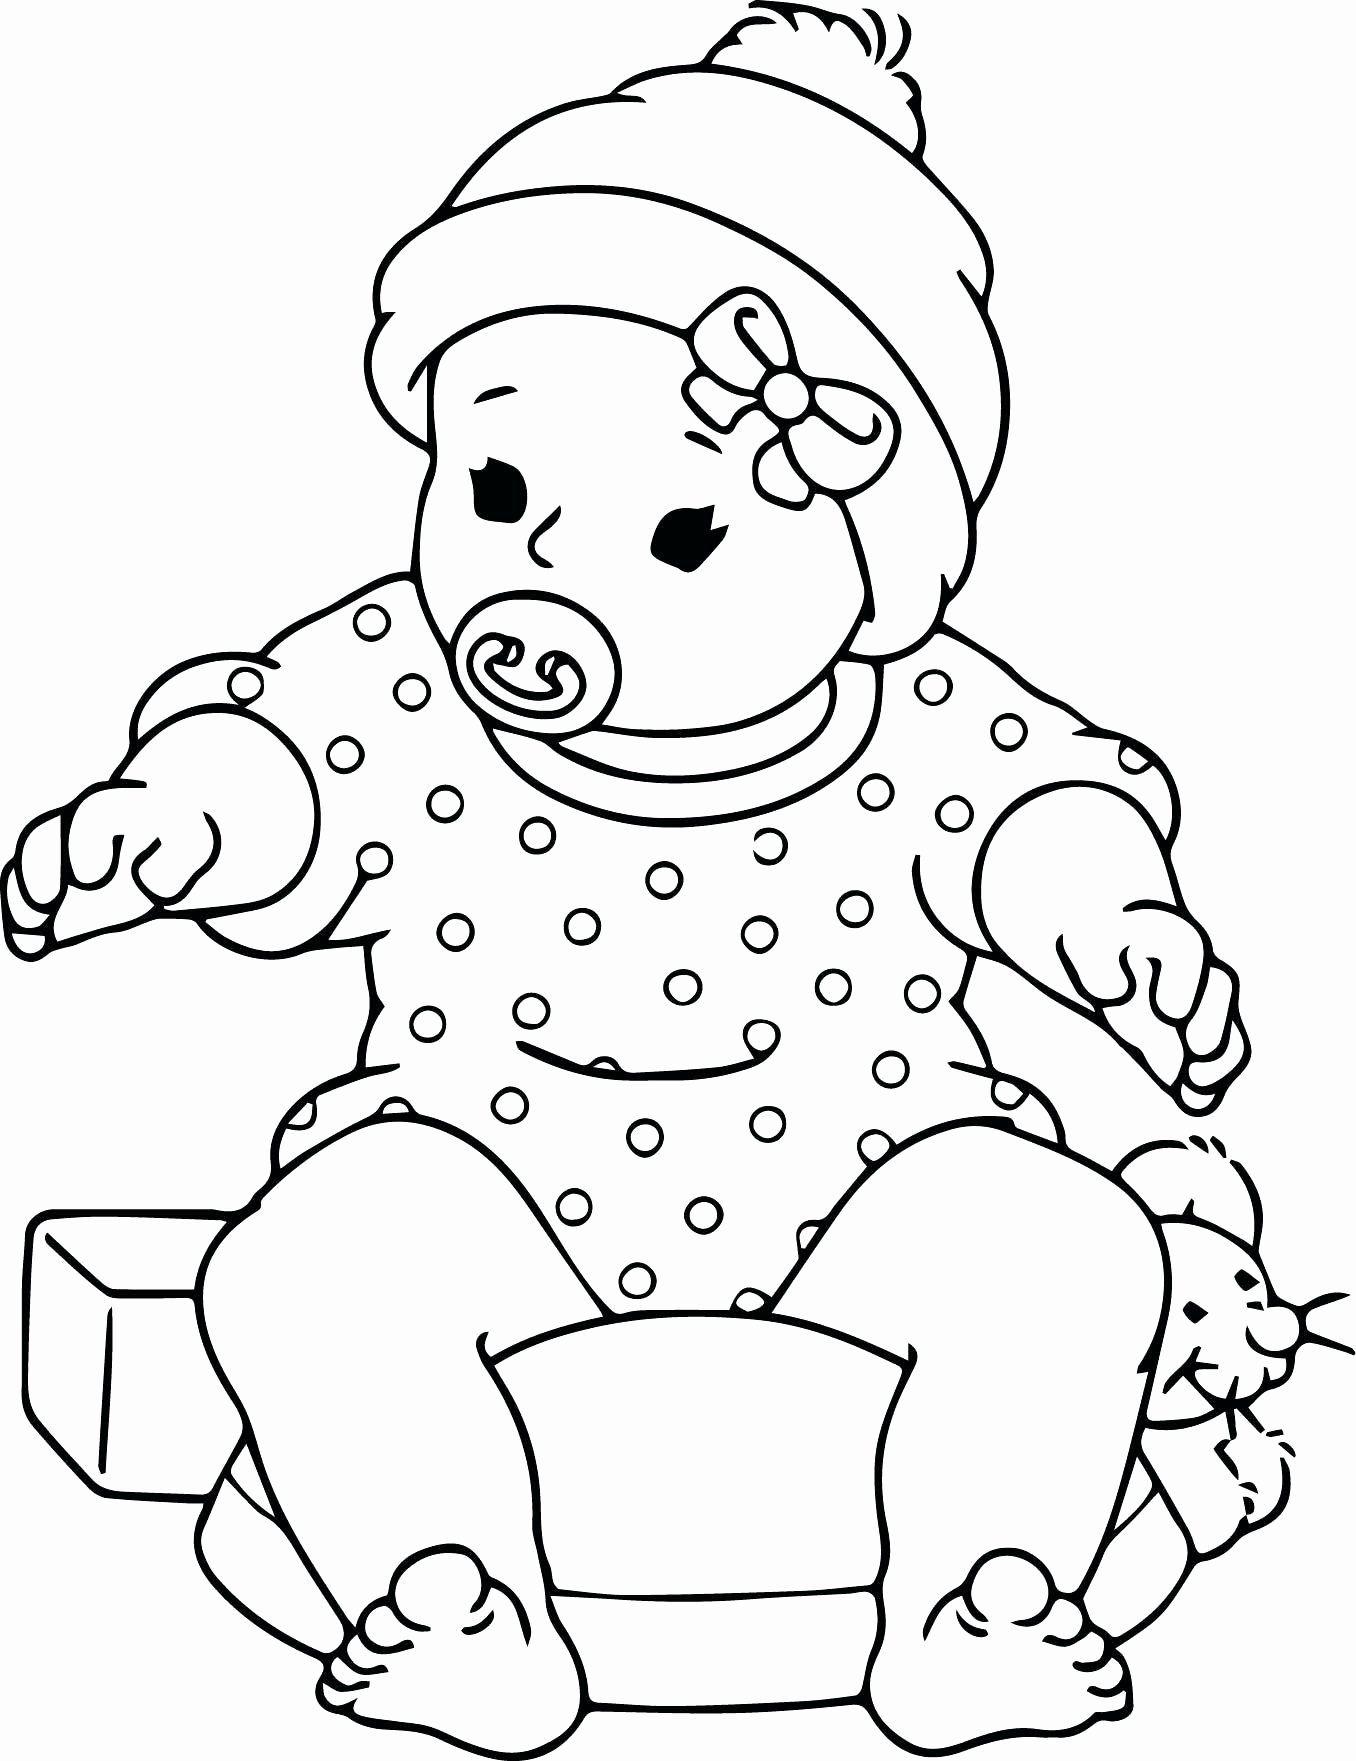 Baby Alive Coloring Page Unique Color Alive Coloring Pages Highendpaper Baby Coloring Pages Puppy Coloring Pages Elephant Coloring Page